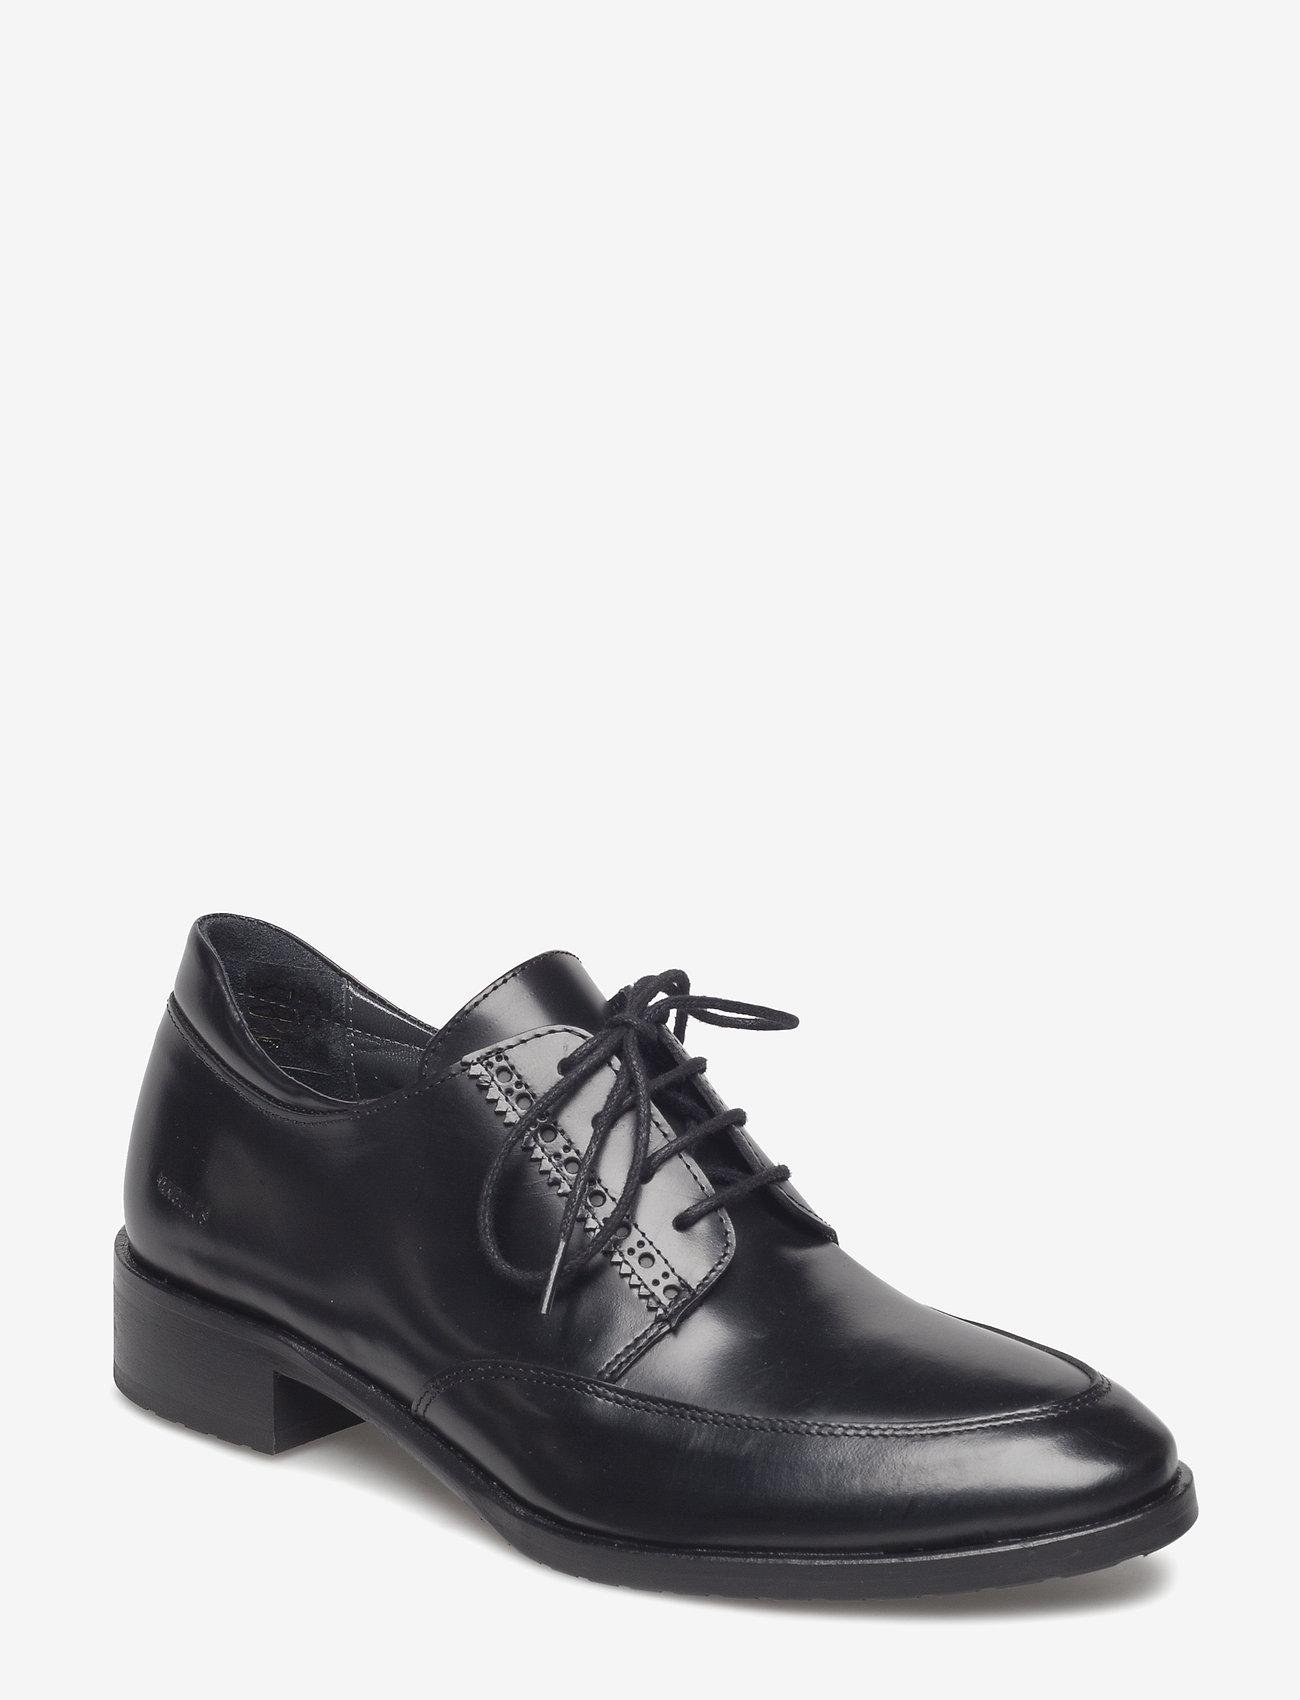 ANGULUS - Shoes - flat - laced shoes - 1400 black